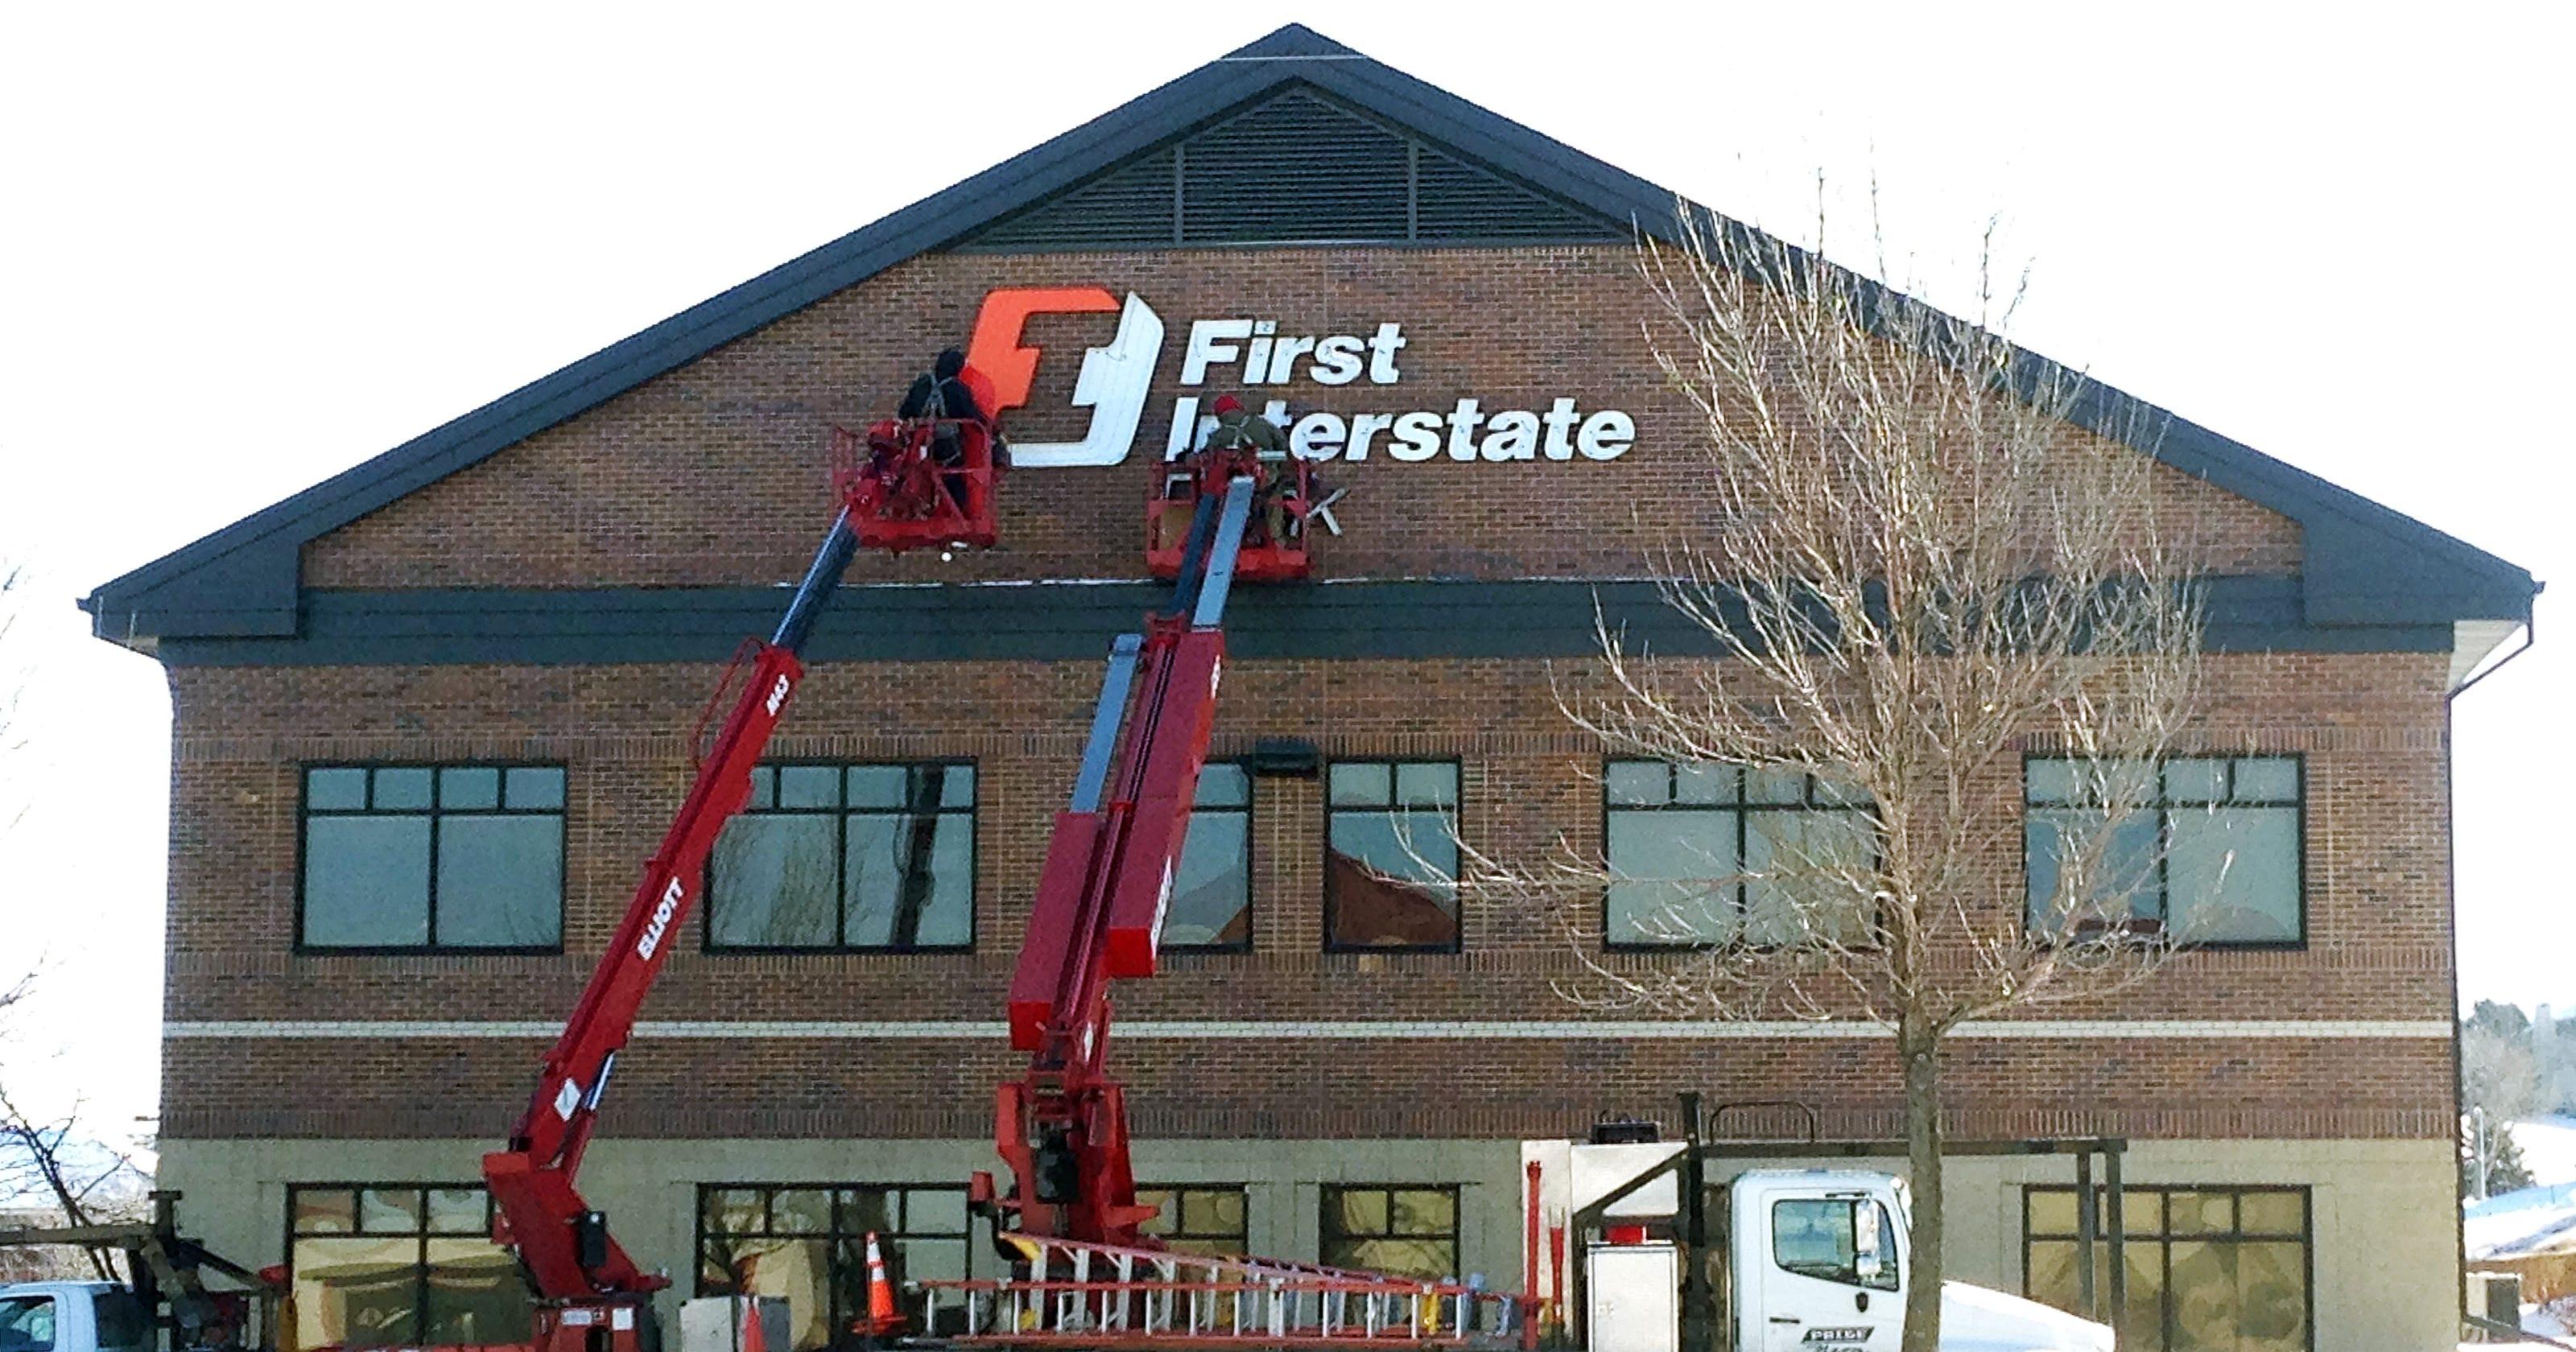 first interstate bank enters market